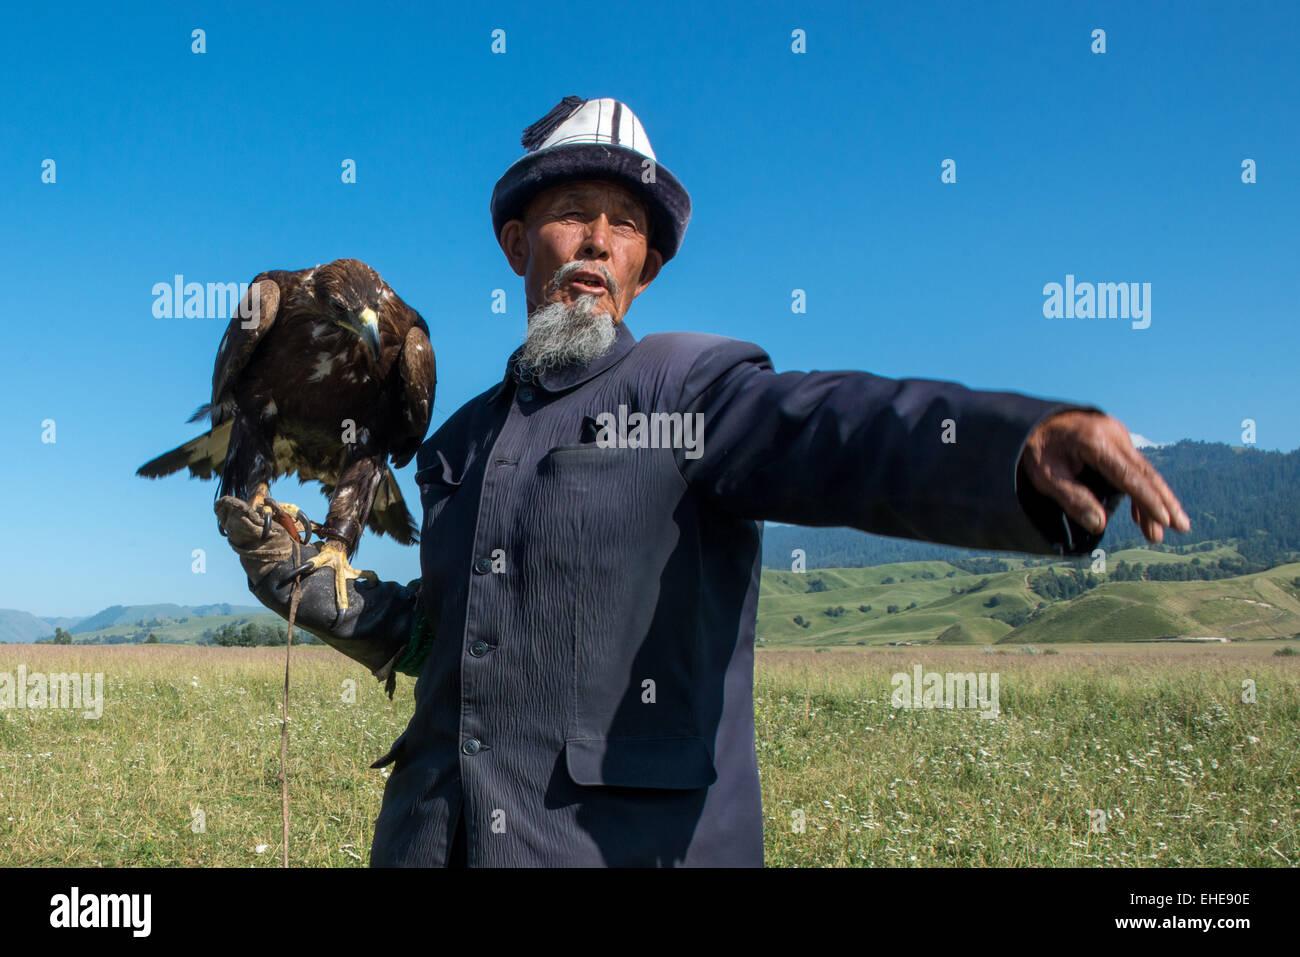 Narat Grasslands, Kazakh And Eagle - Stock Image